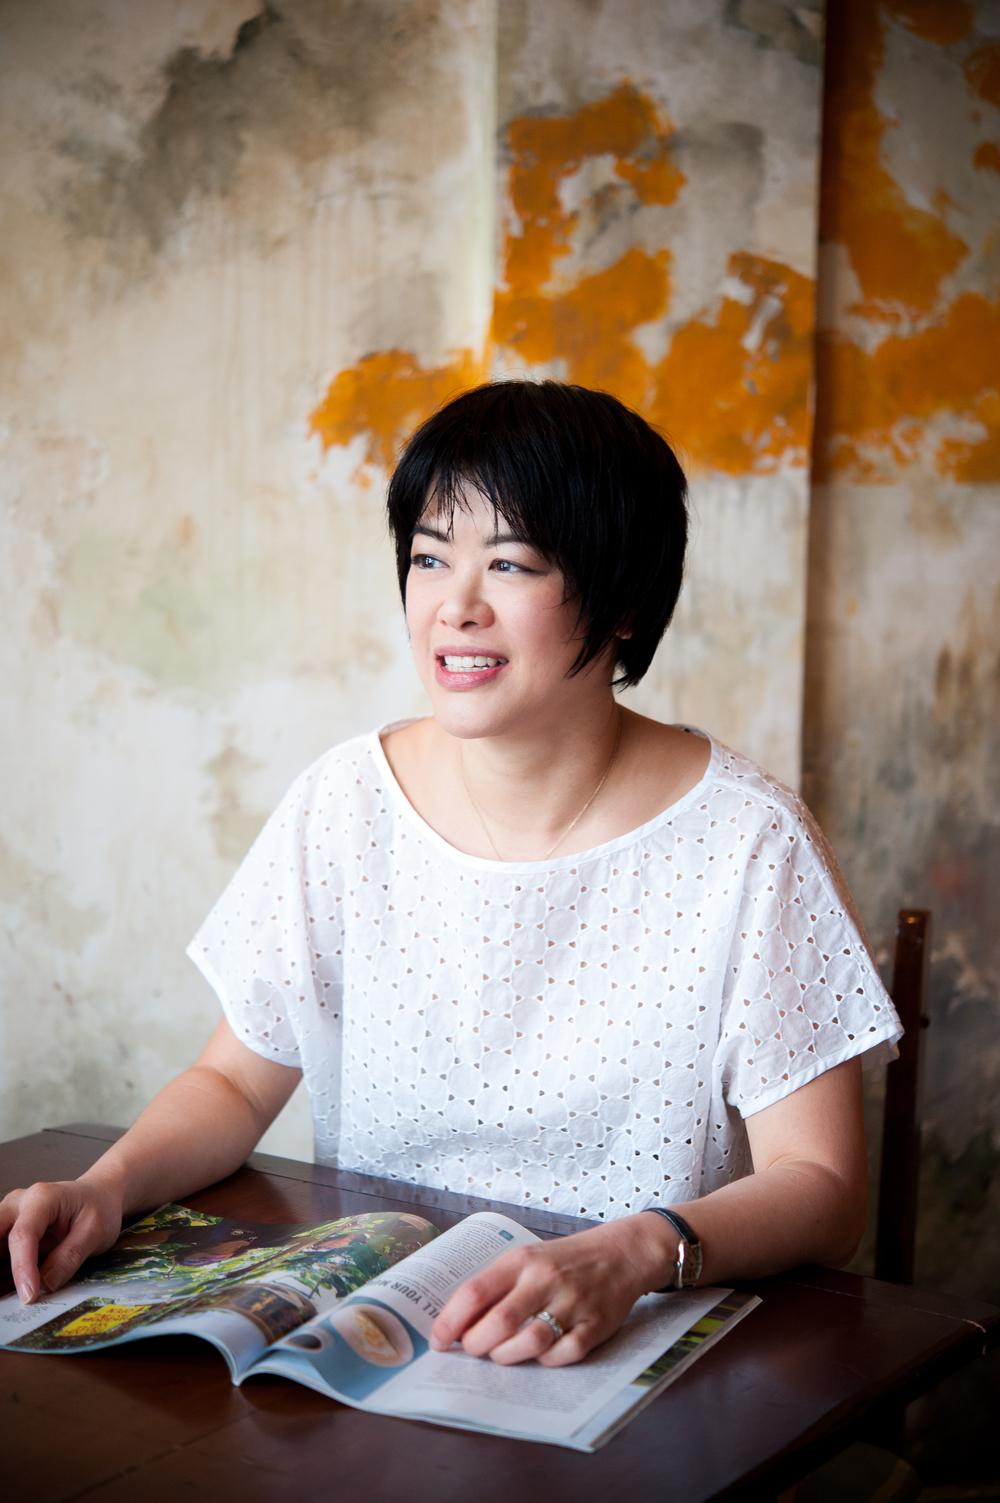 June-wei Sum, Founder Lilikoi Living